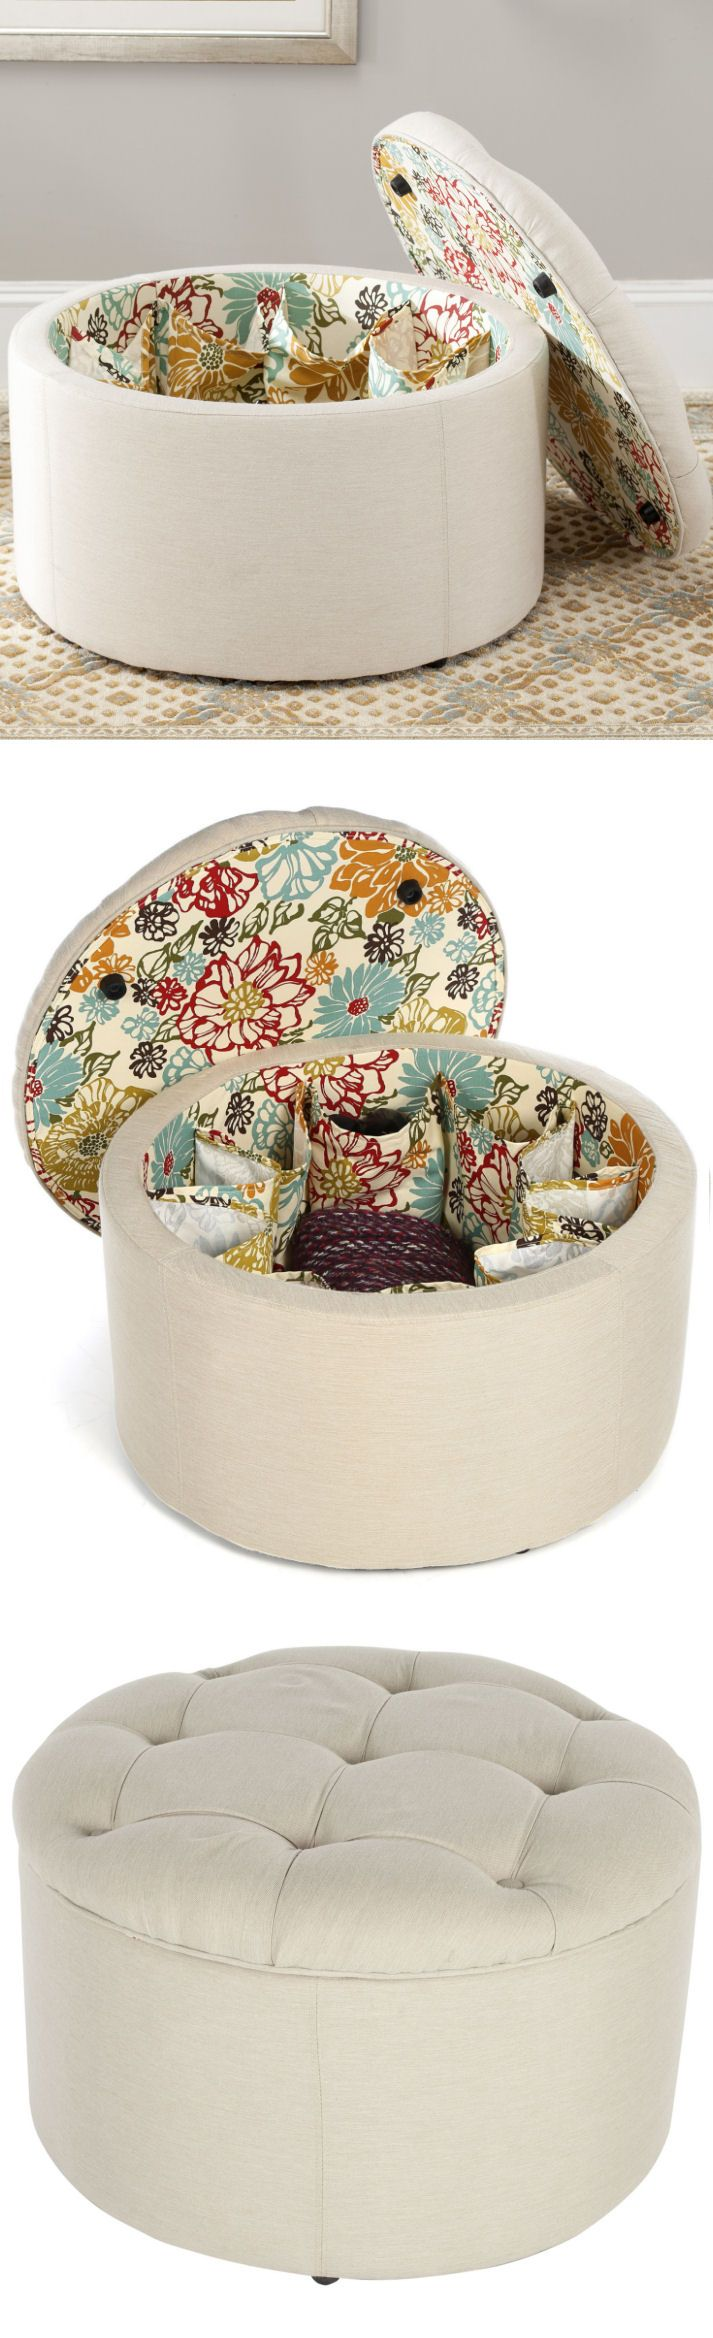 Shoe Storage Ottoman in Ivory ♥